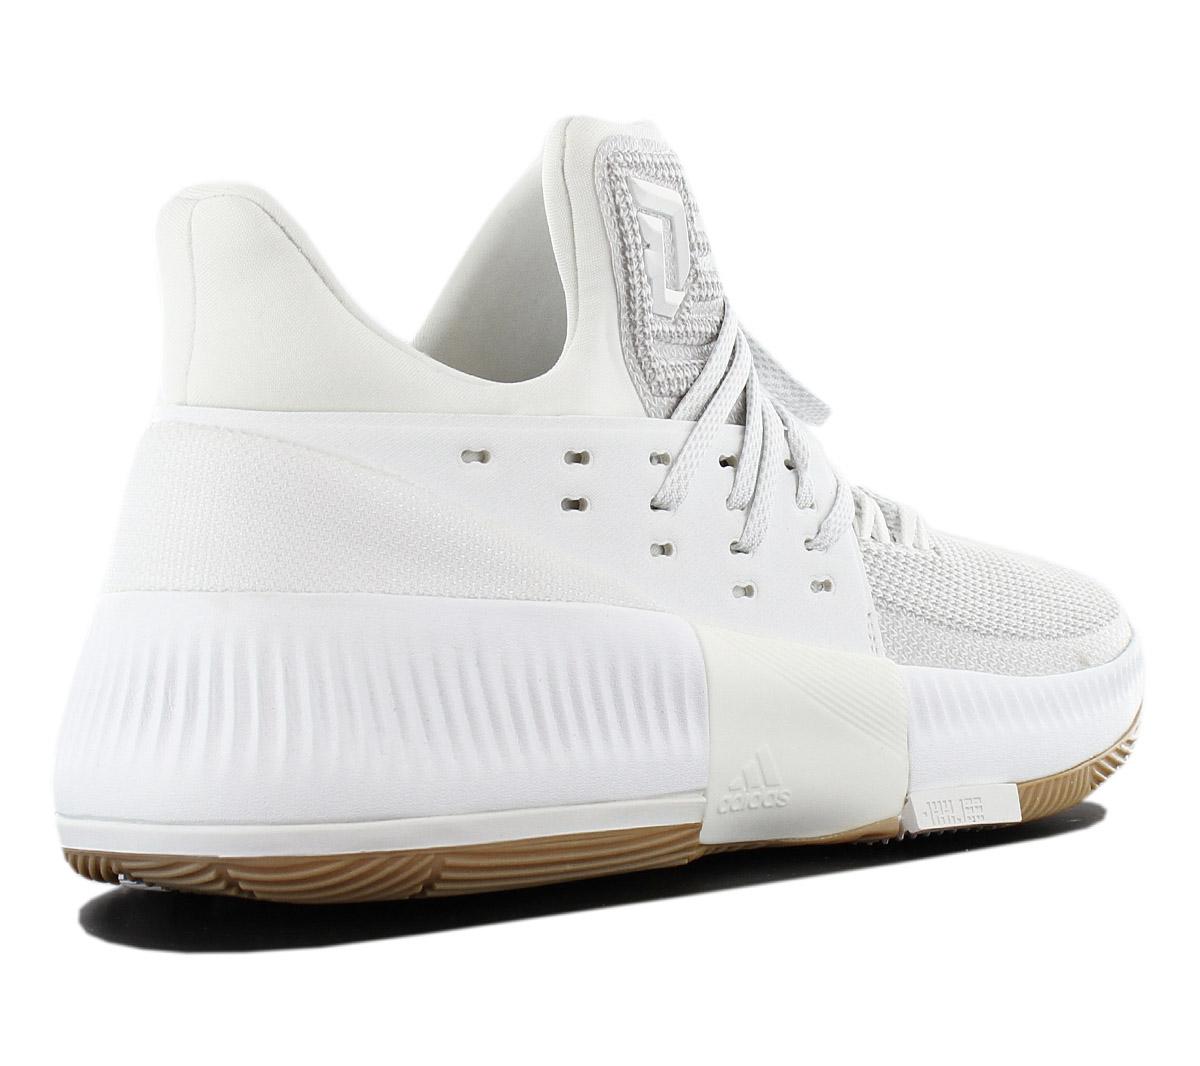 99db4002c9fd Adidas Dame D Lillard 3 Men s Sneakers Baketball Shoes Shoes Bw0323 ...